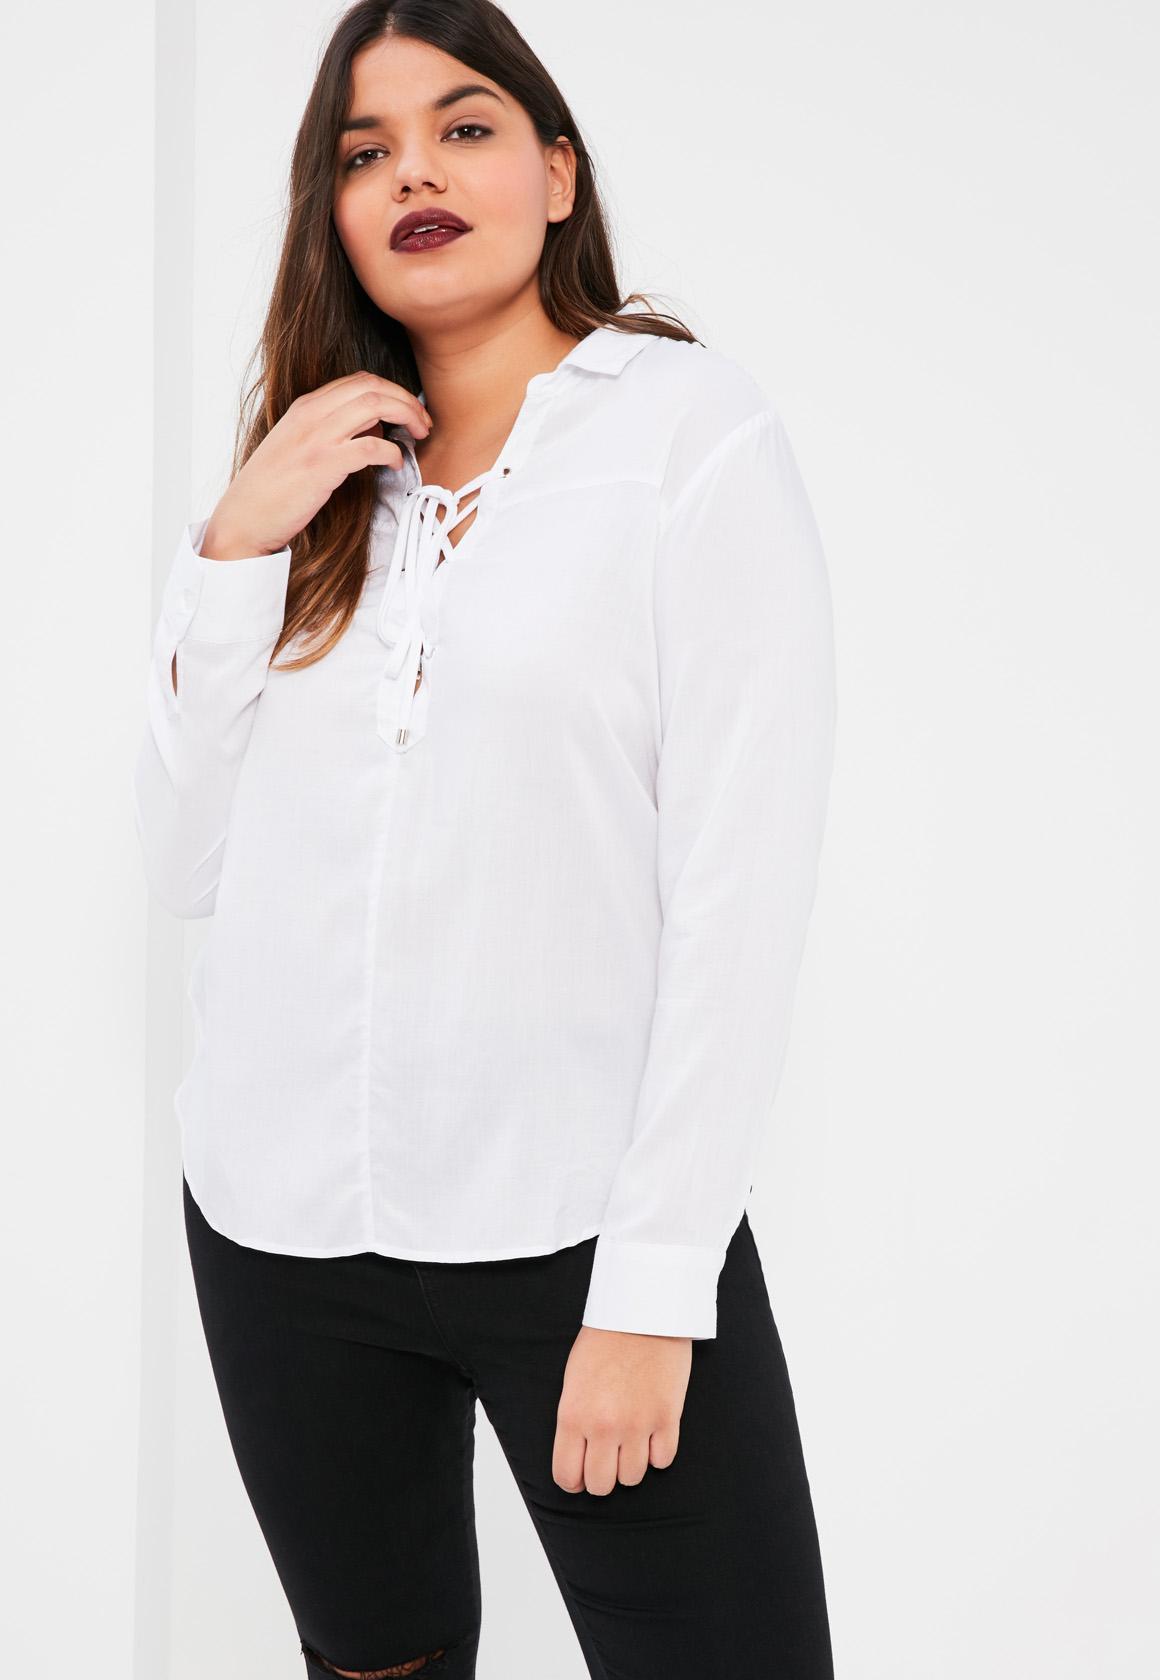 ad906fabd5e9e Mandarin Collar Blouse Plus Size